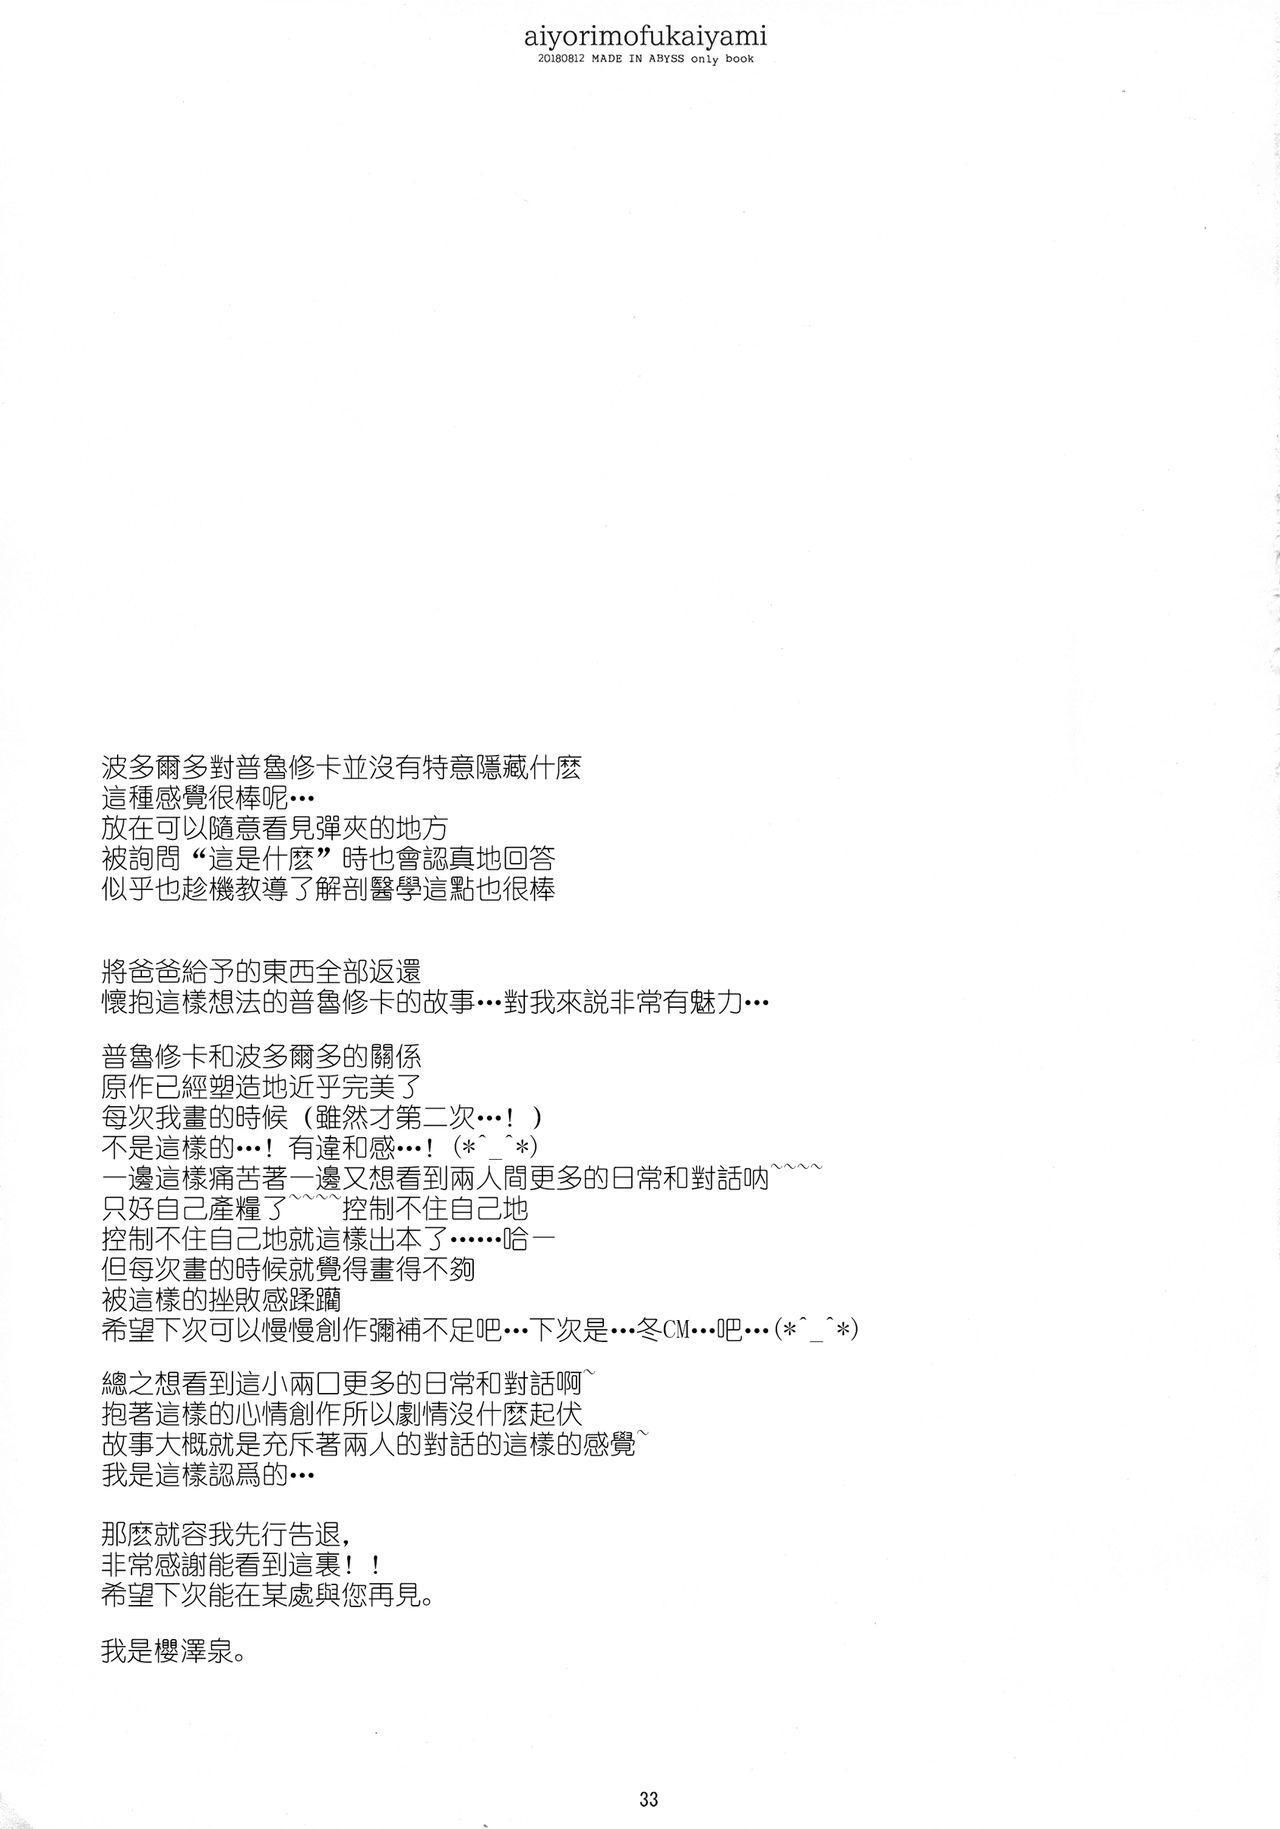 Ai yori mo Fukai Yami 丨比愛還要深的黑暗 33